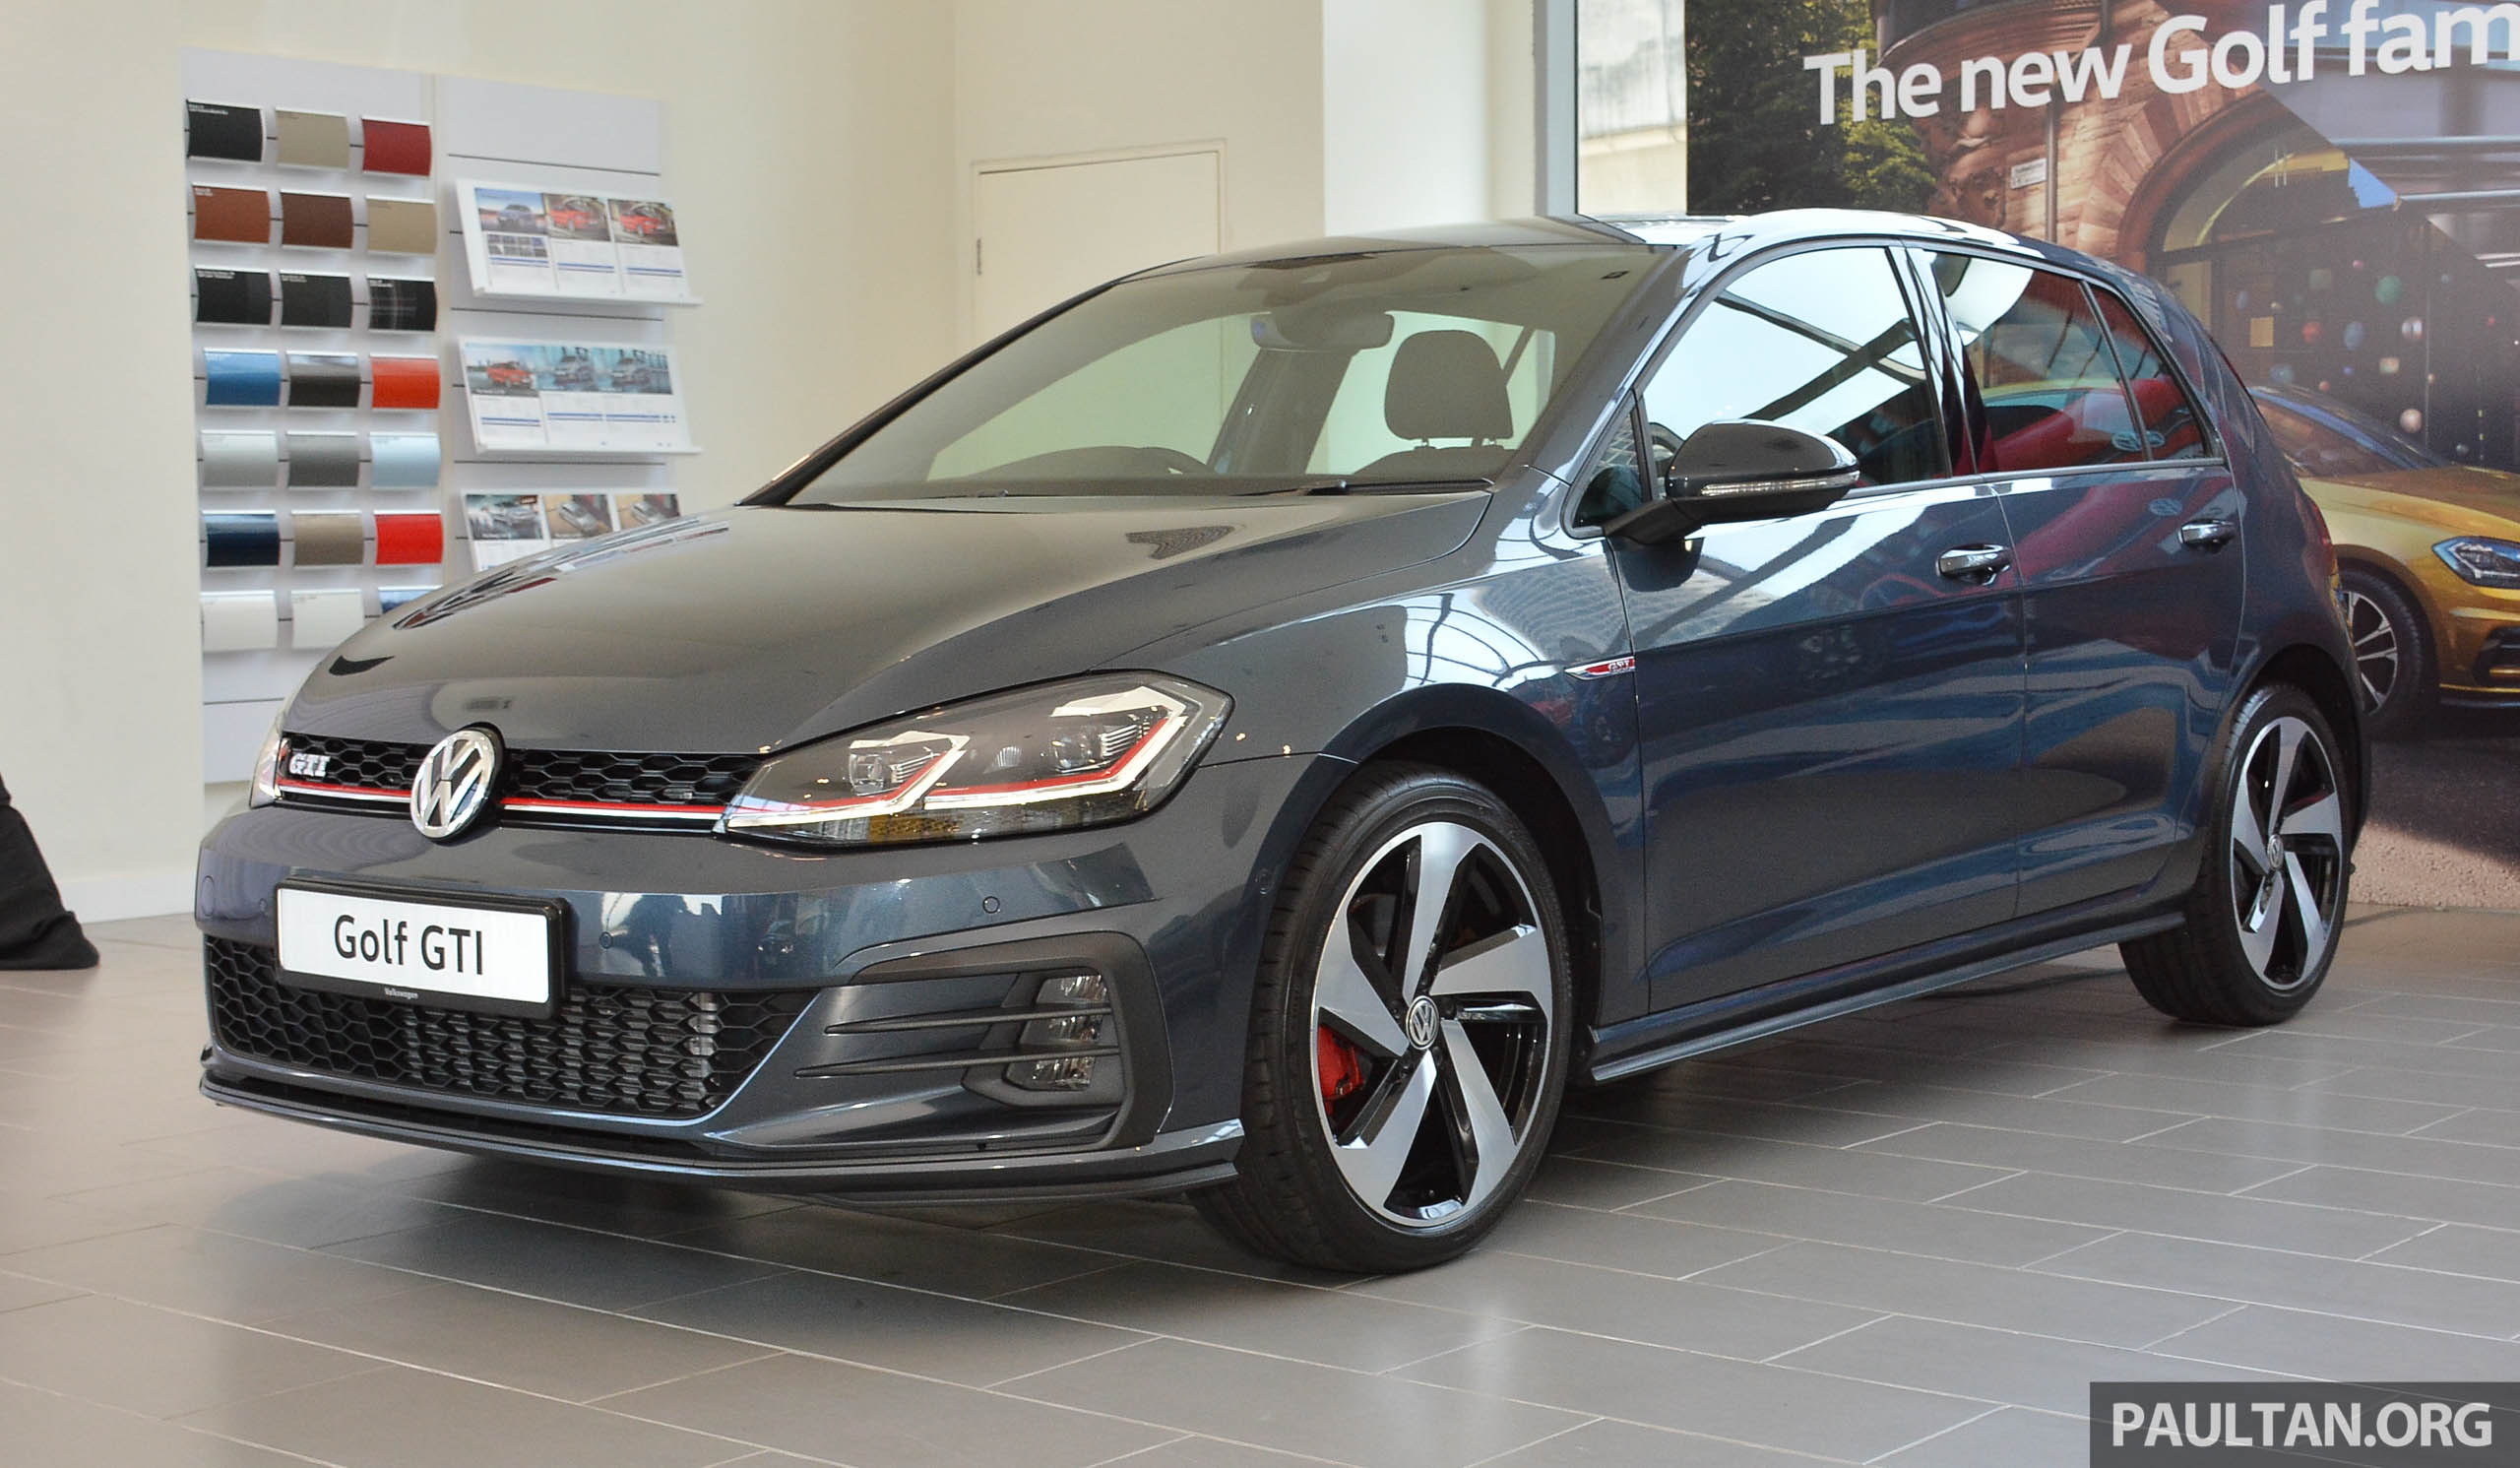 2018 Volkswagen Golf Gti Facelift Launched Rm240k Paultan Org